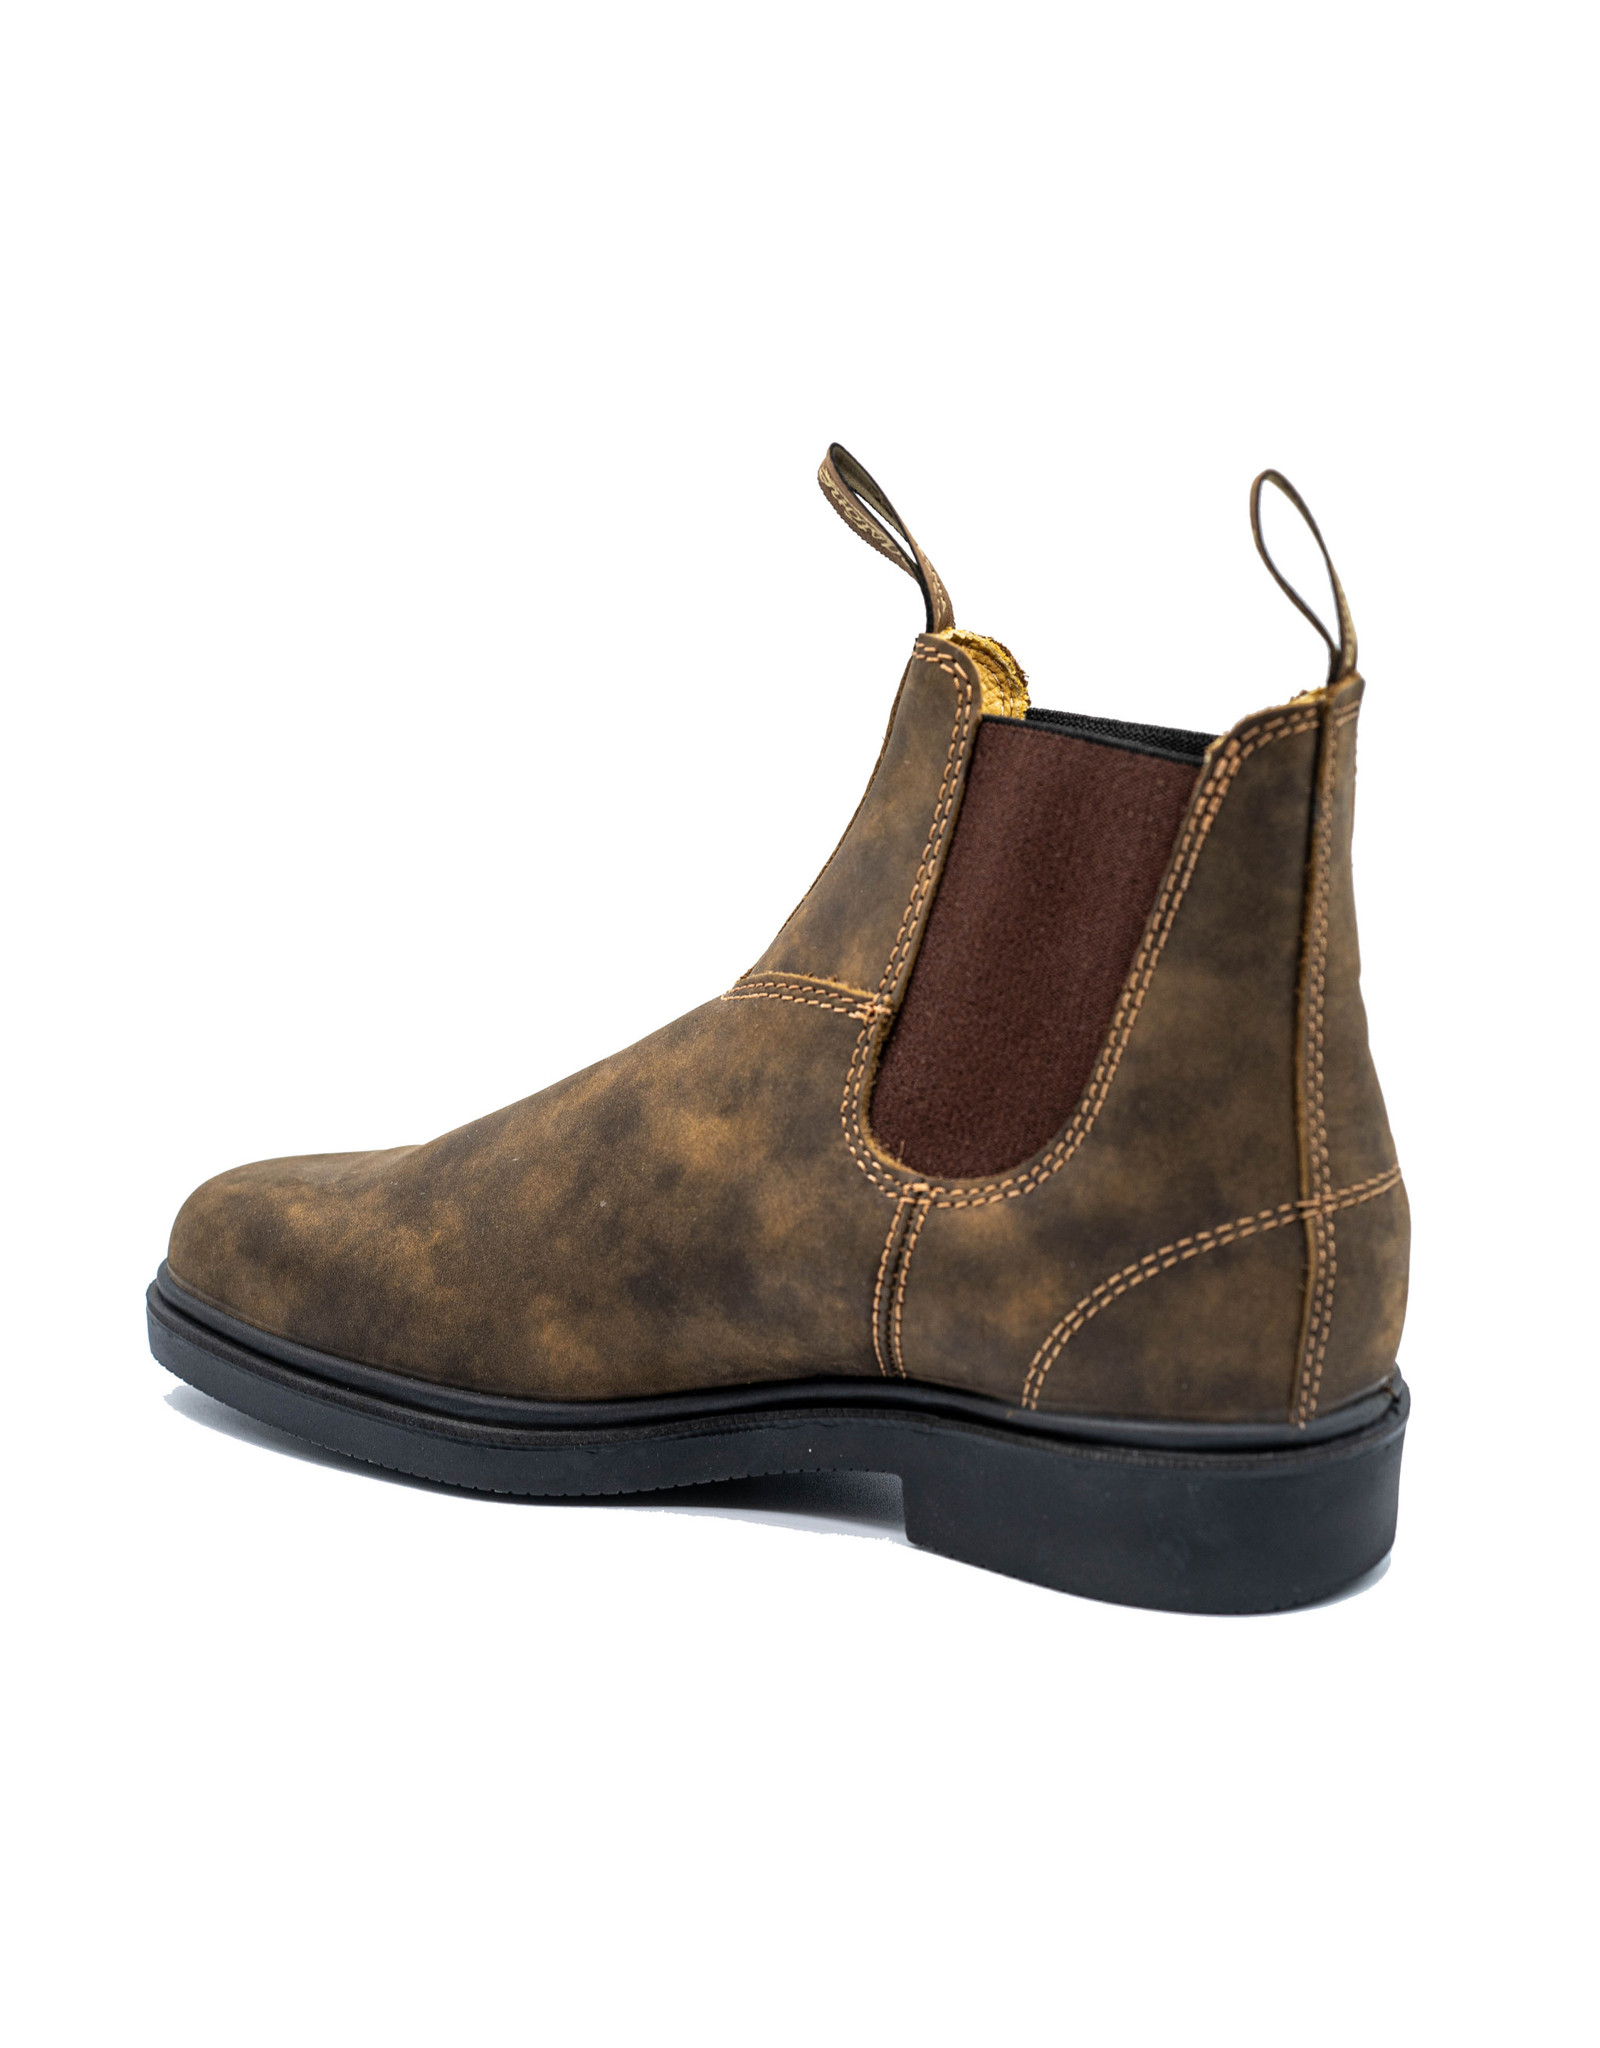 BLUNDSTONE 1306 - Botte ciselée habillée en brun rustique